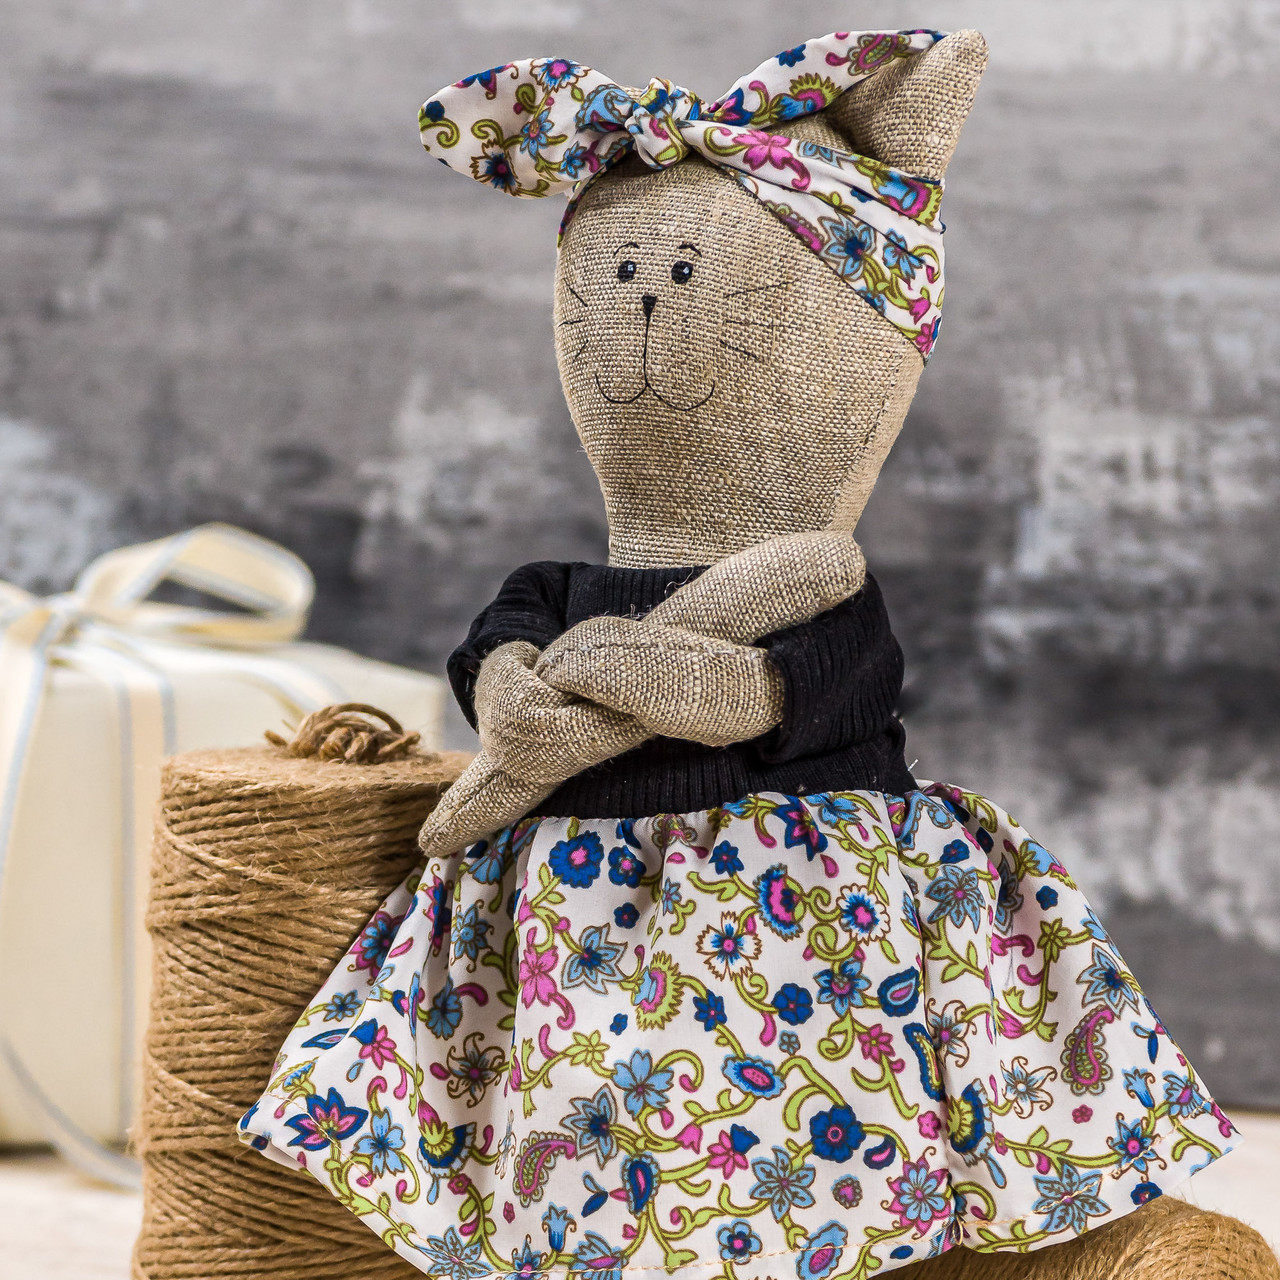 "Мягкая игрушка ручная работа лен кошка Светло-розовый высота 33 см  ""звірята-хіпстерята"" киця одежда снимается"